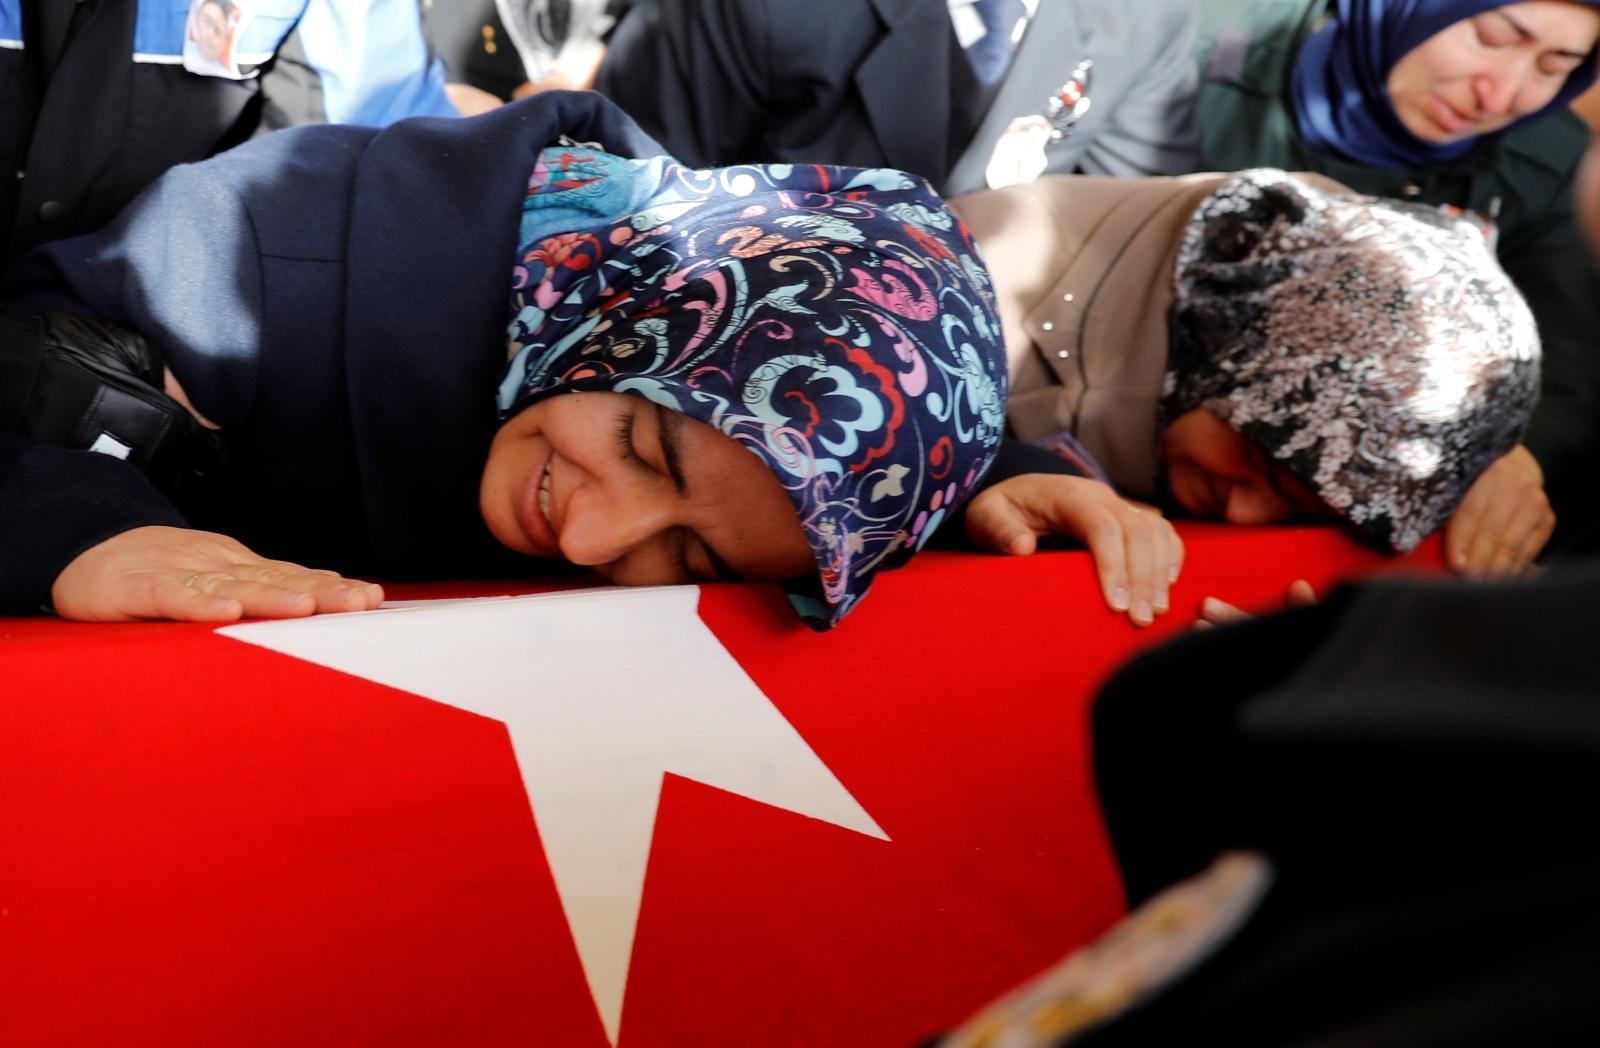 Turkey Besiktas bombing funeral 2016